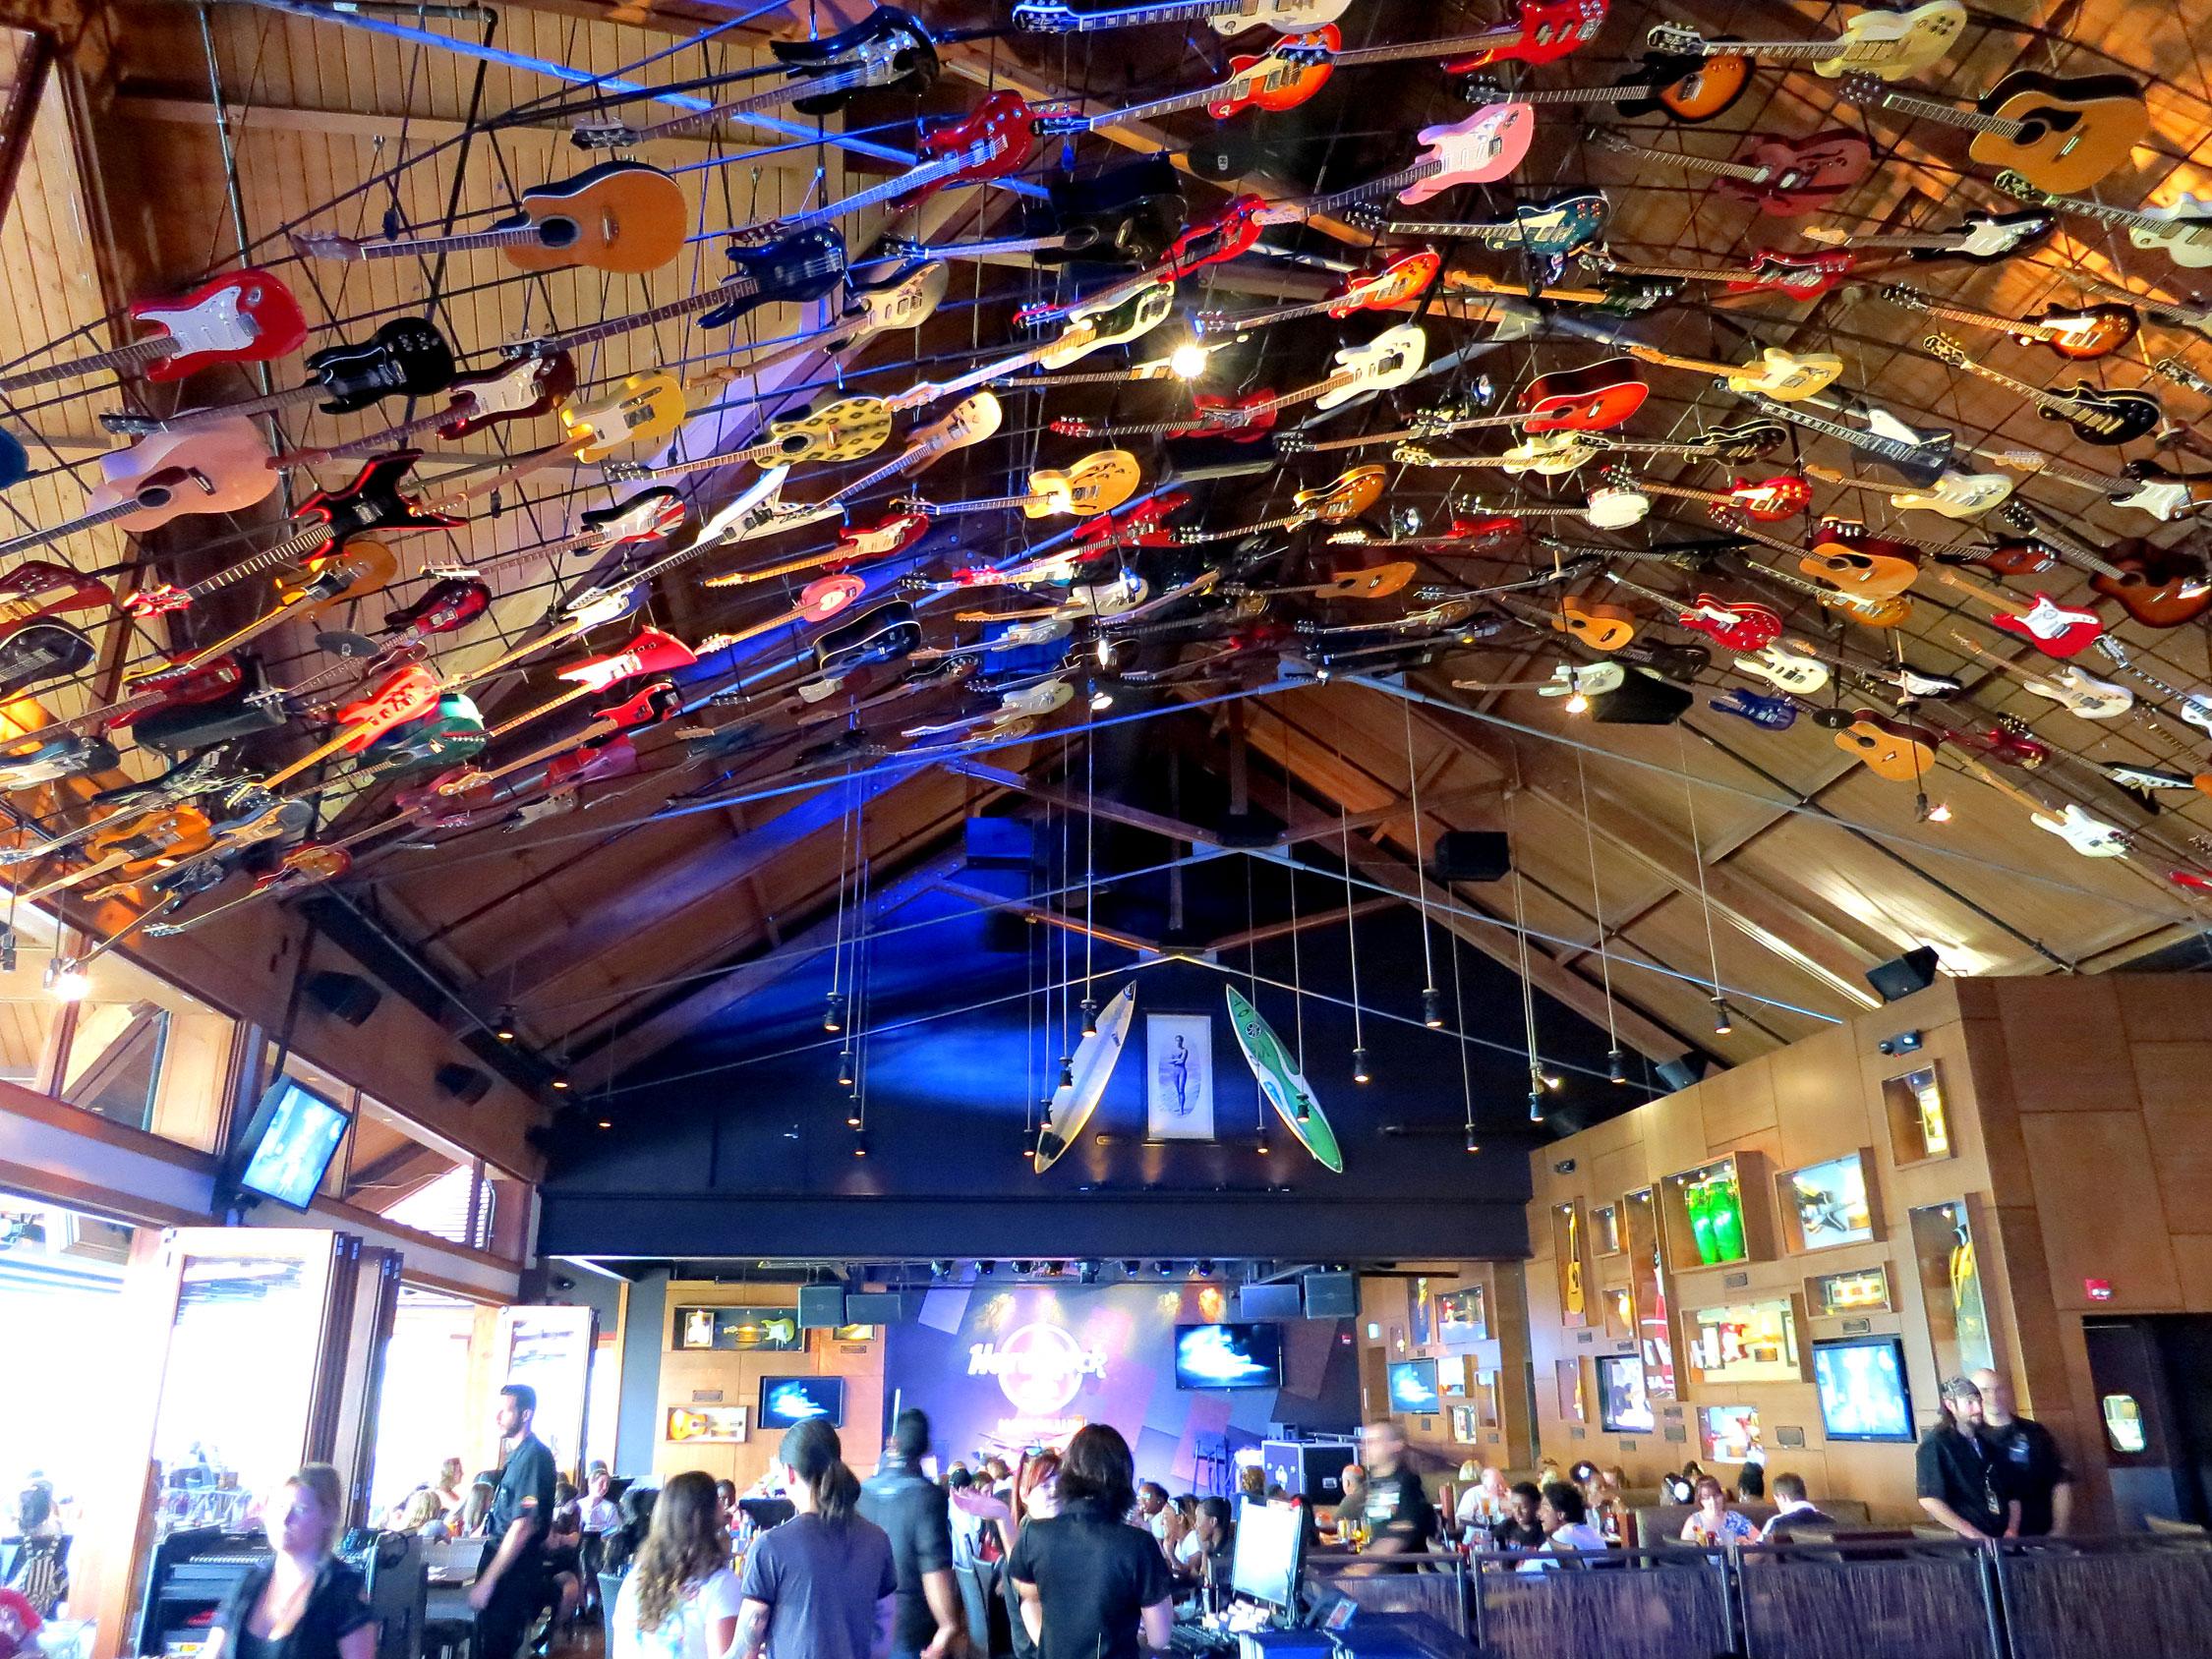 Hard Rock Cafe Rolls Out New Menu Tasty Island